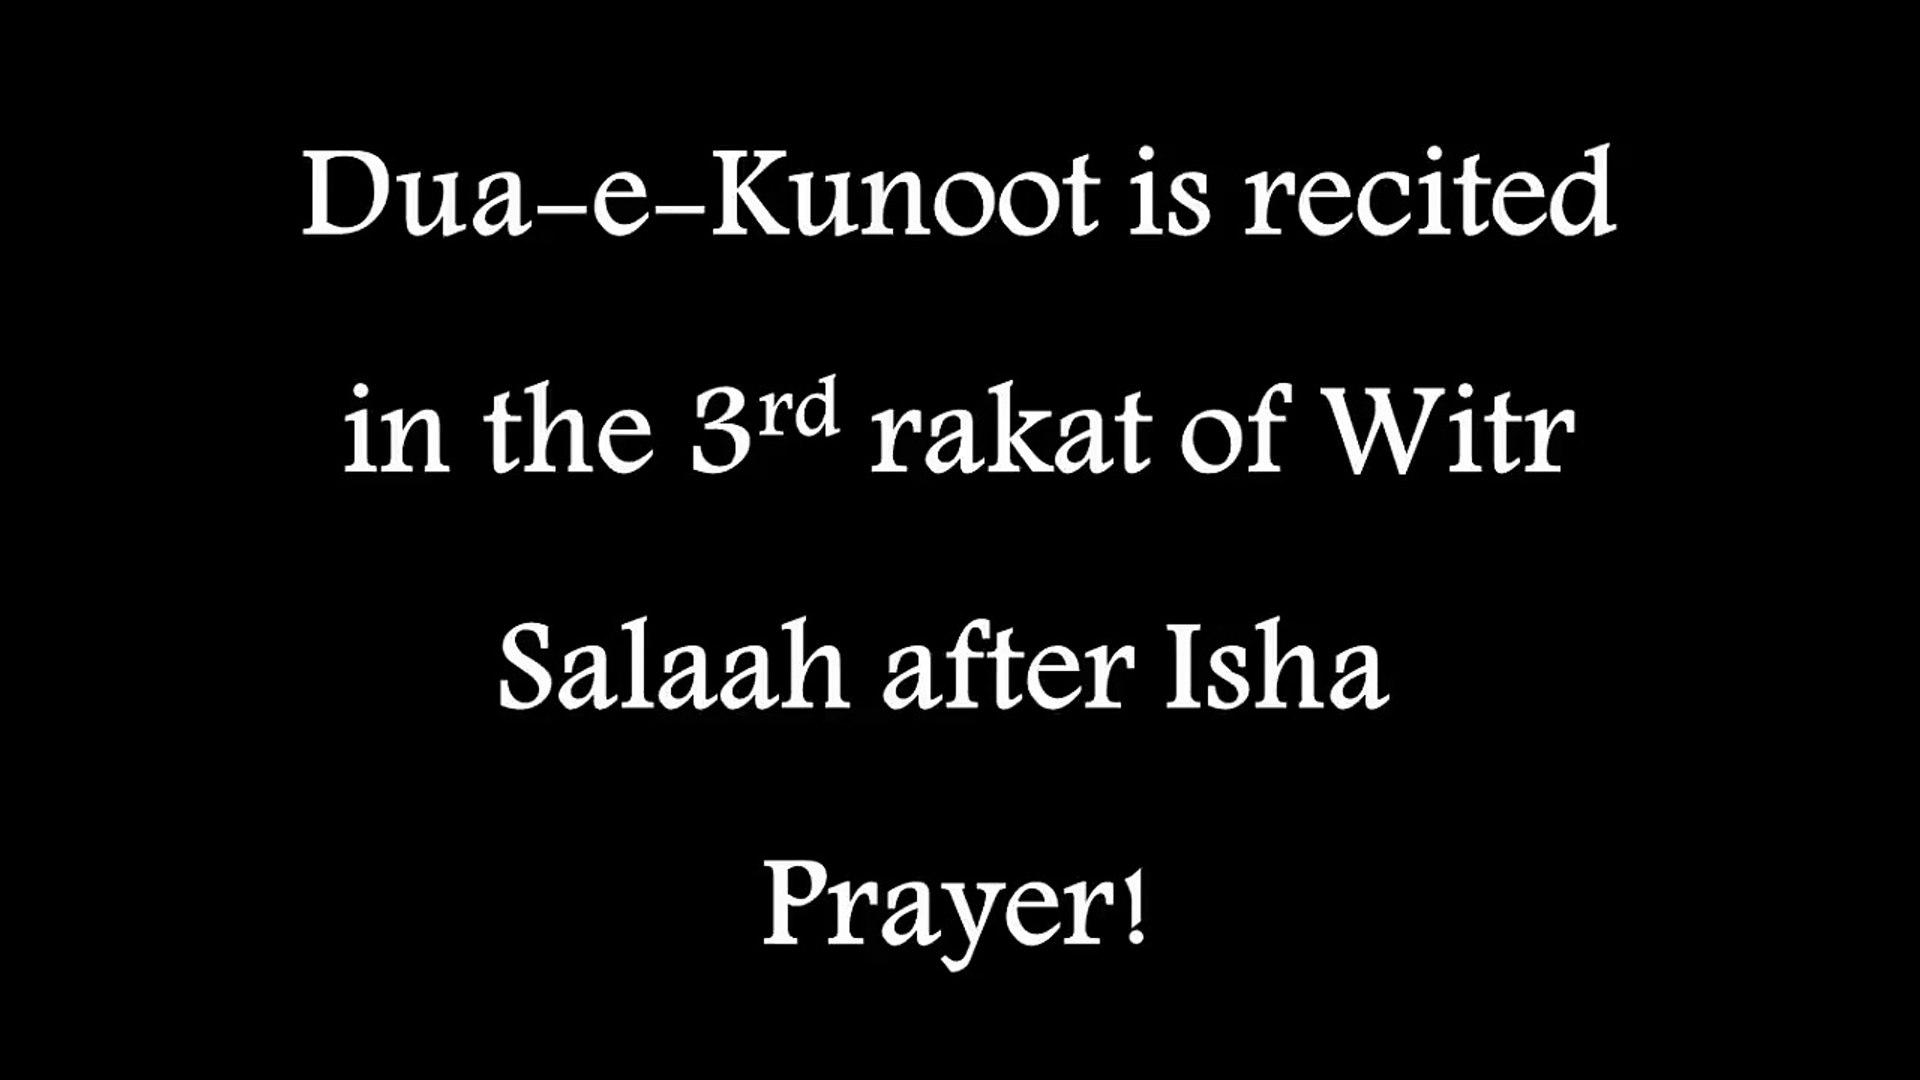 Dua e Qunoot - Witr (Hanafi) - Recitation - English Translation,  Transliteration [HQ]